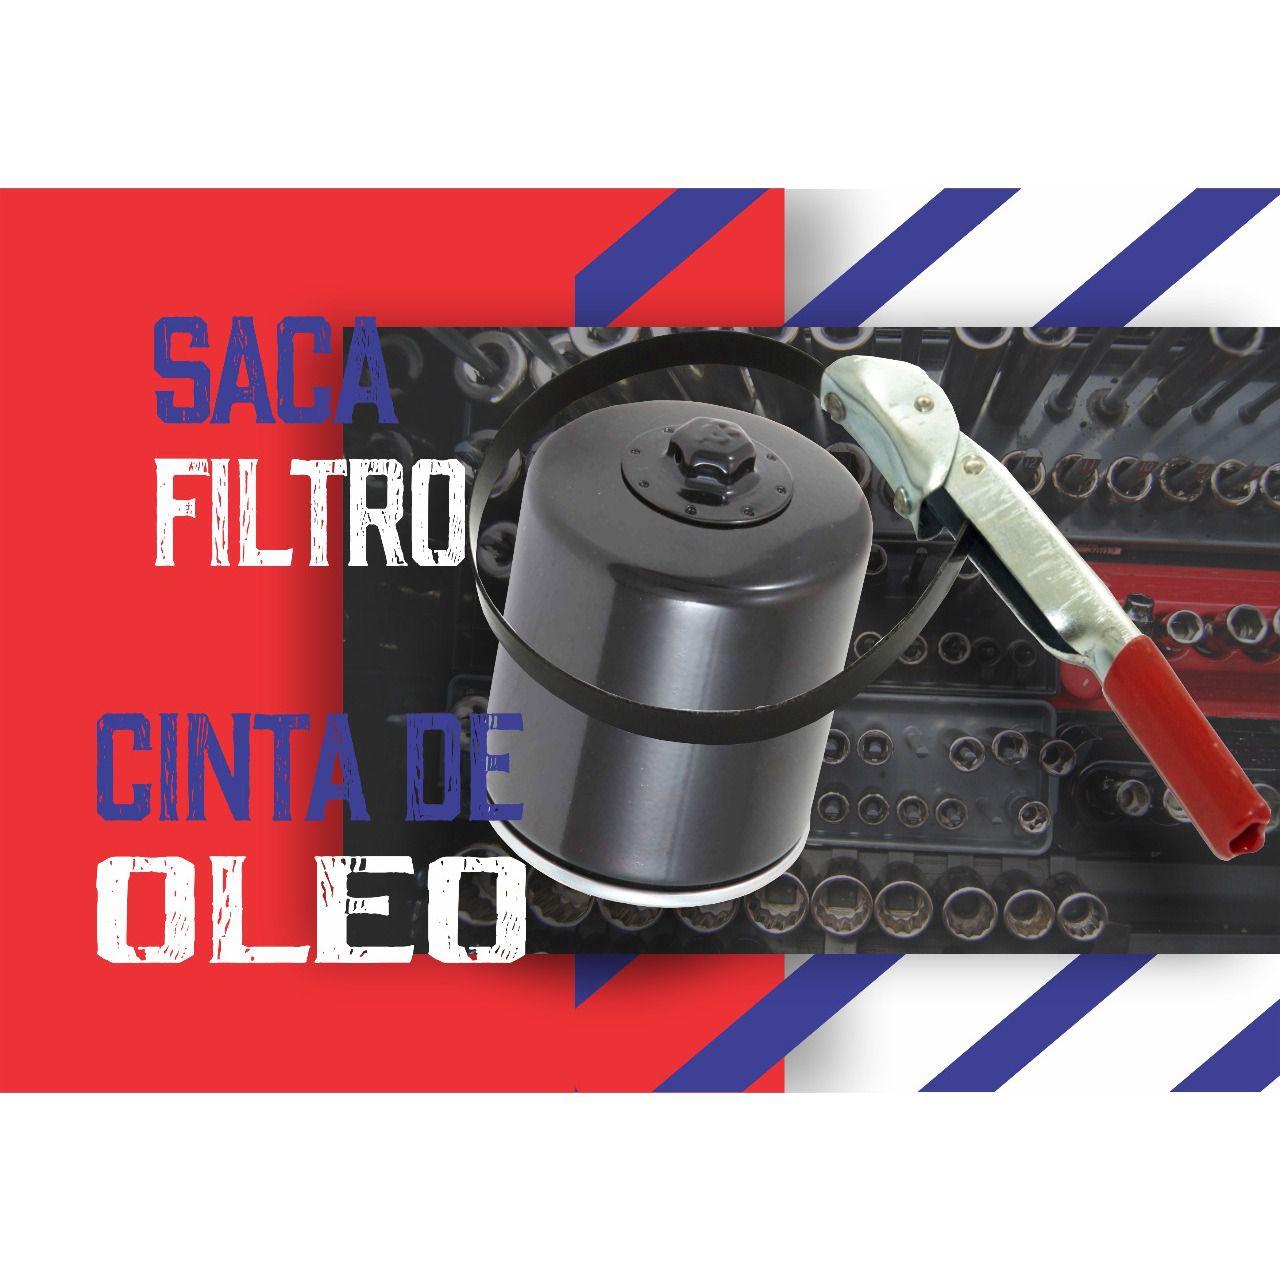 Chave Saca Filtro Cinta De Óleo  Volkswagem,Kia 71 x 82MM -   - Rea Comércio - Sua Loja Completa!